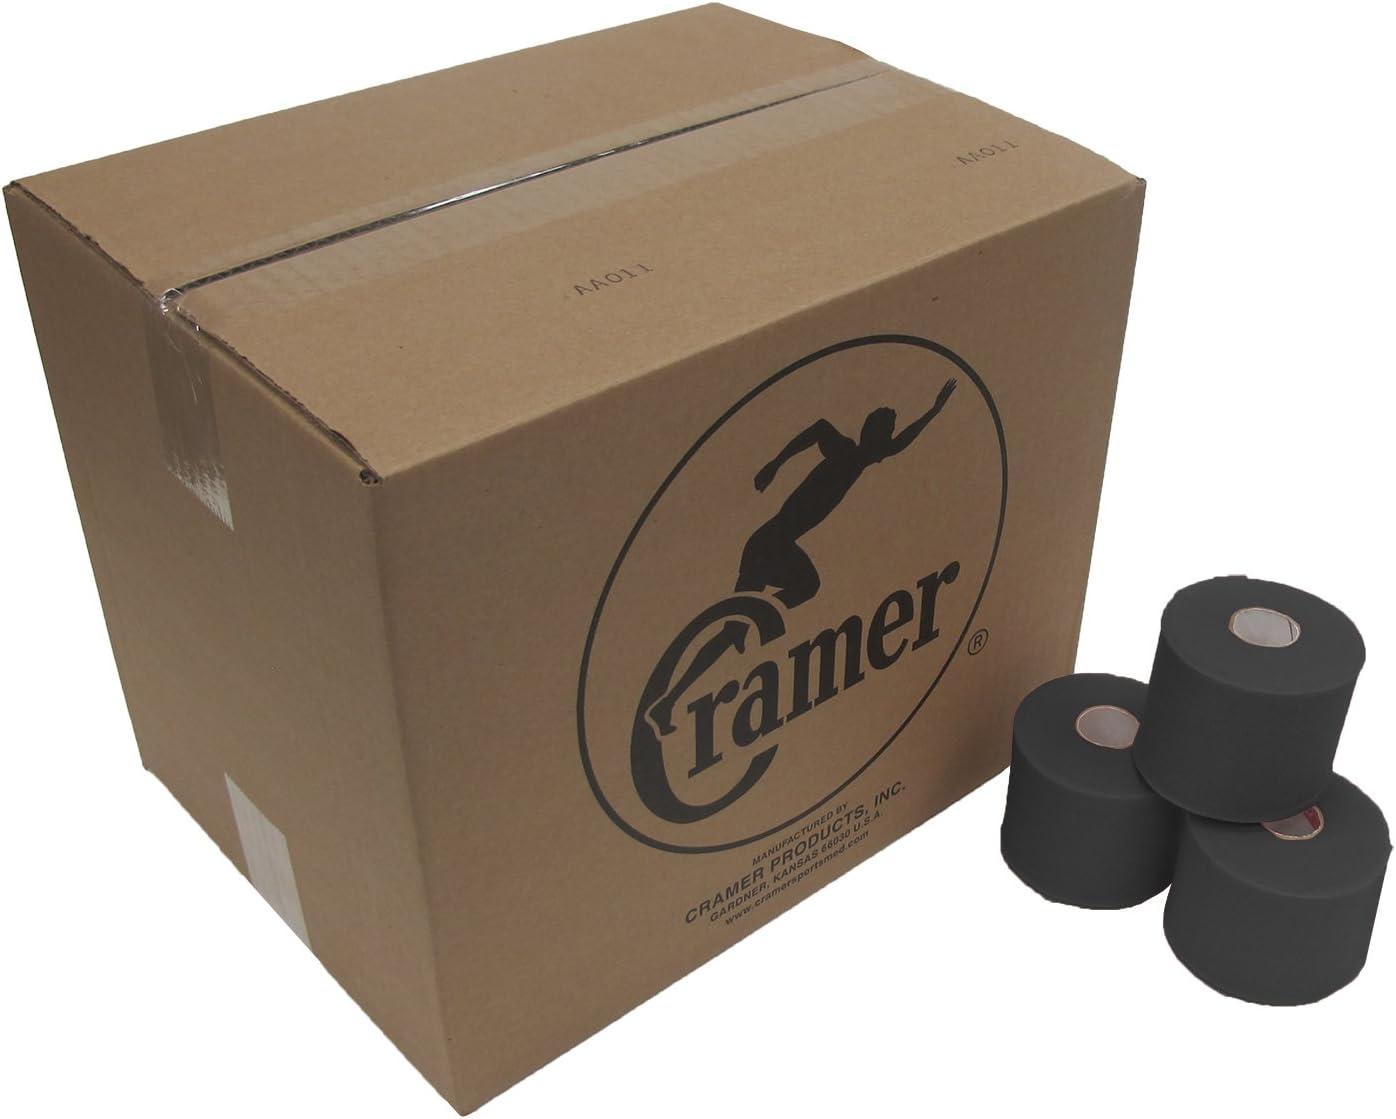 Cramer Tape Seasonal Wrap Introduction Underwrap Bulk Case of PreWrap for Athl Rolls 48 Wholesale